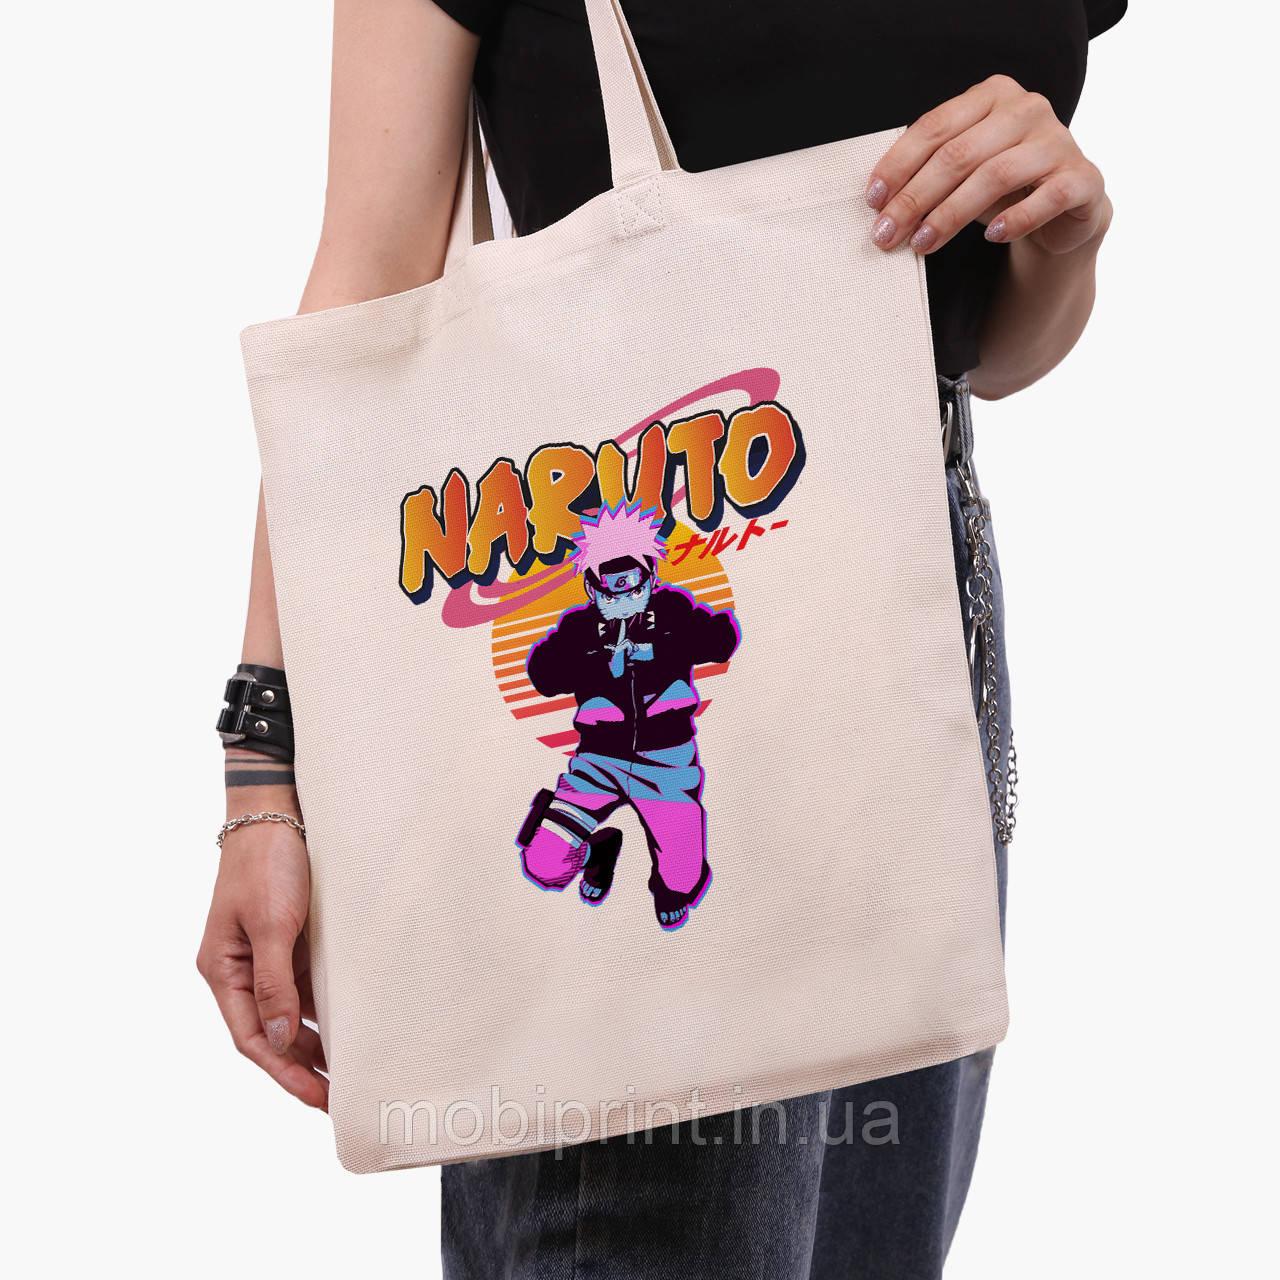 Еко сумка шоппер Наруто Узумакі (Naruto Uzumaki) (9227-2629) 41*35 см